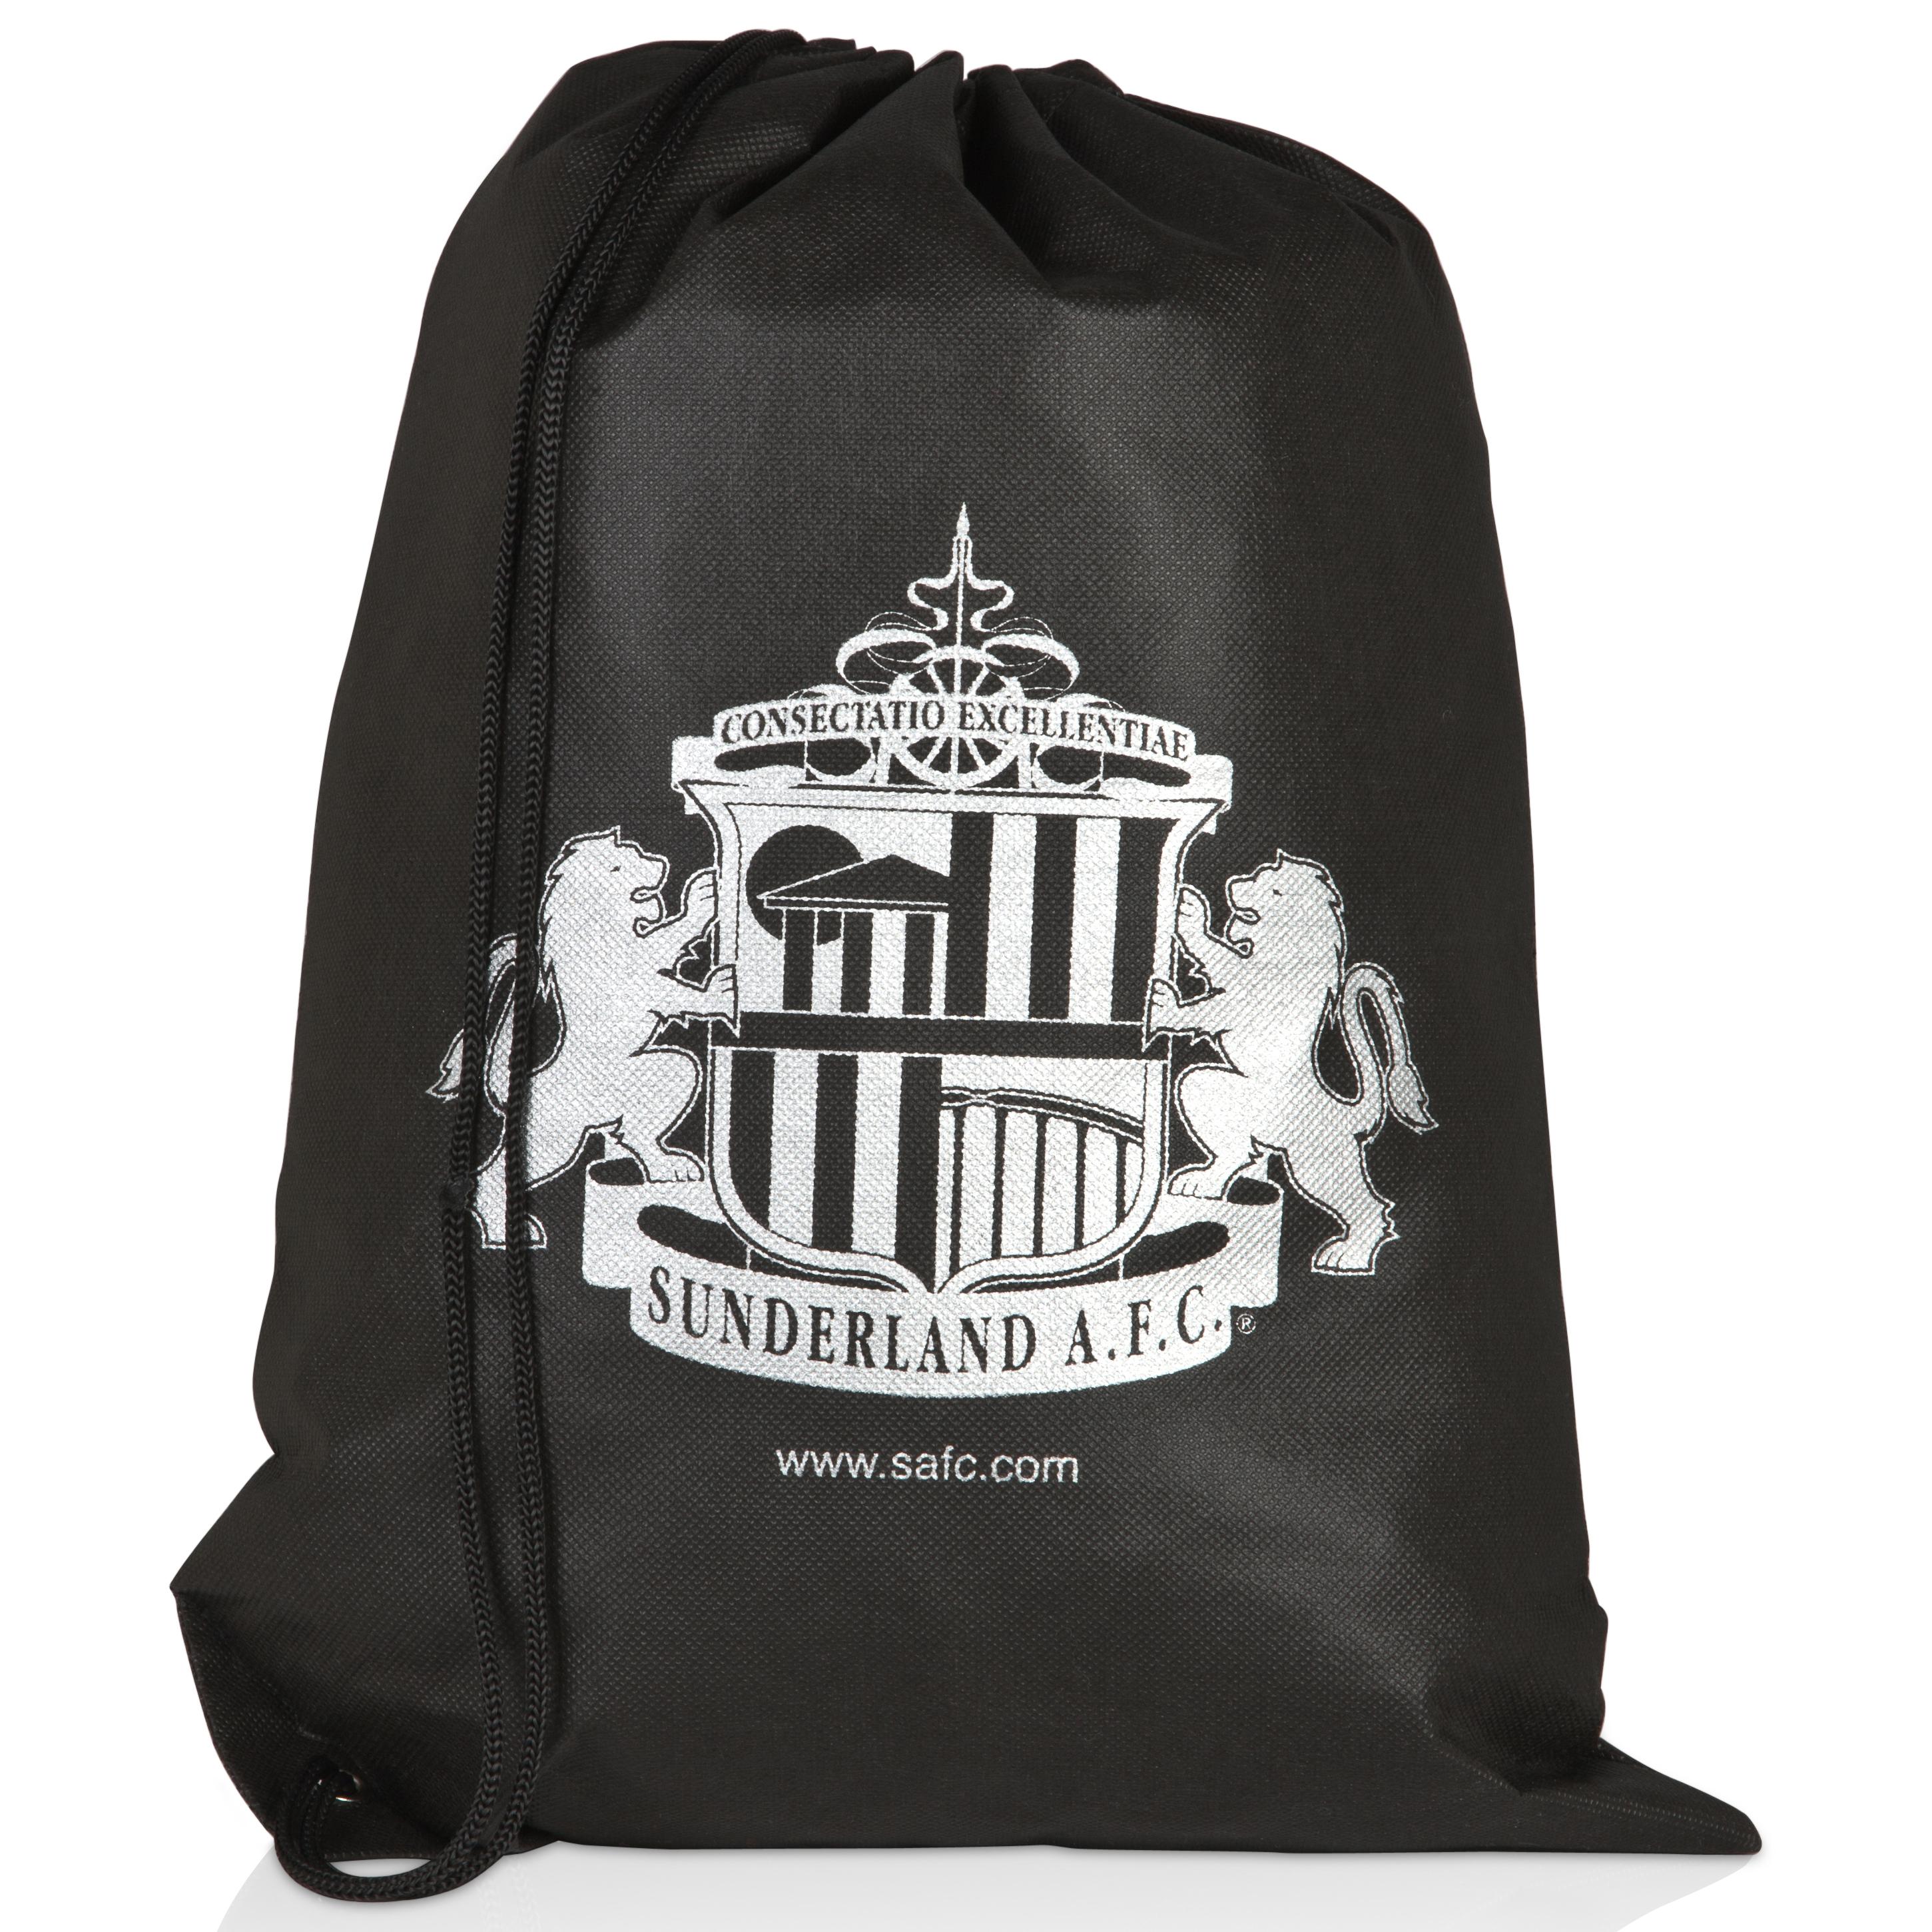 Sunderland Rope Bag for Life